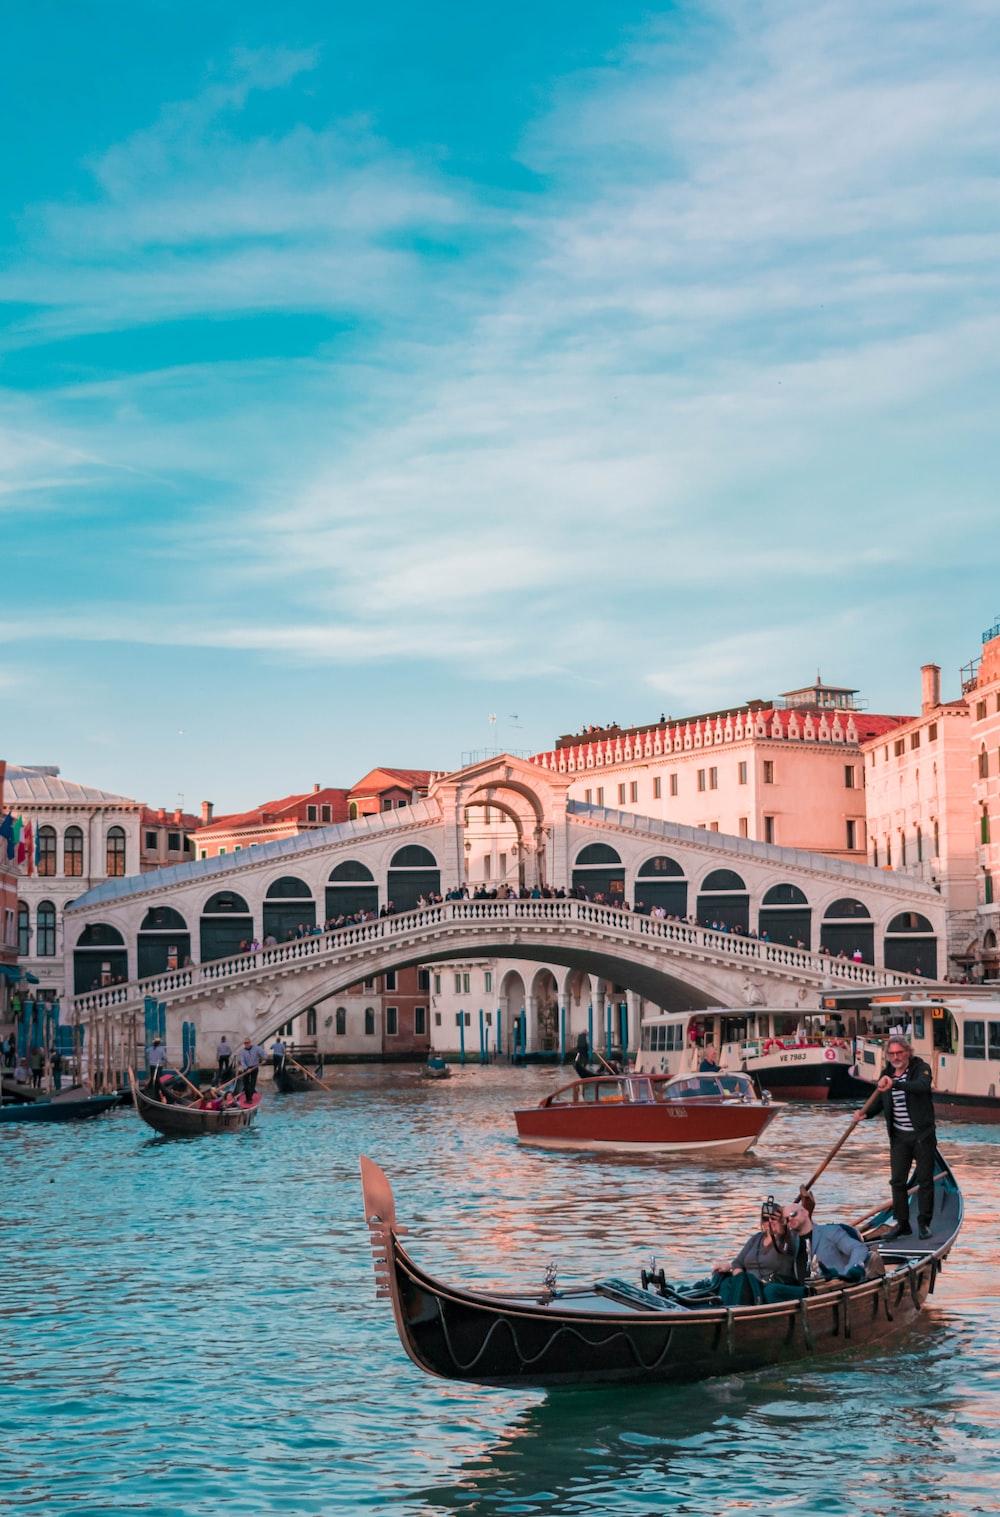 Rialto Bridge, Venice Italy